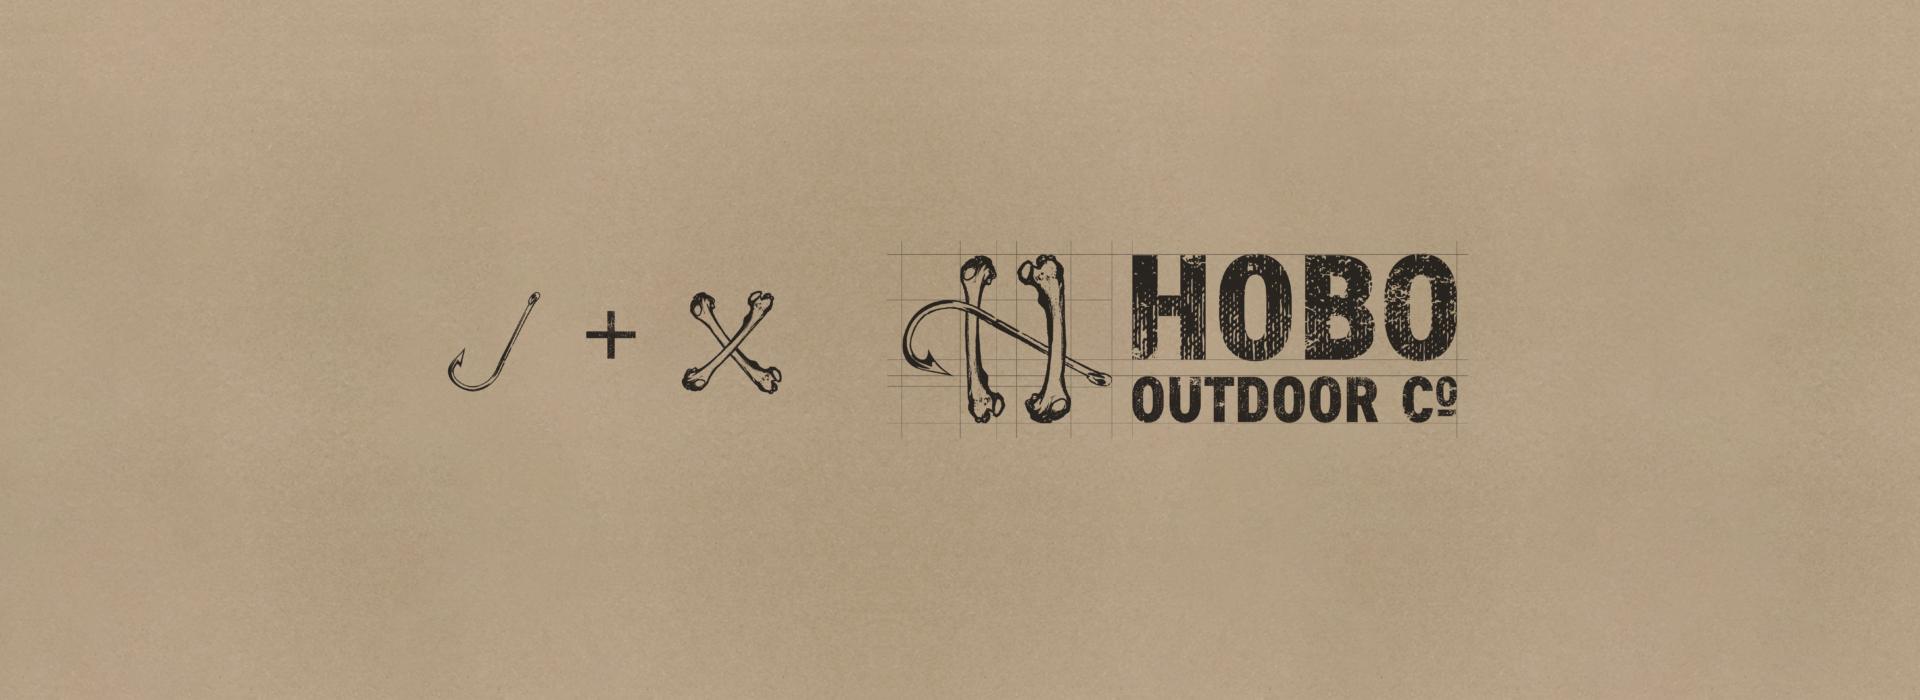 Hobo Outdoor Co. | Logo | Branding | The Underground Design Studio